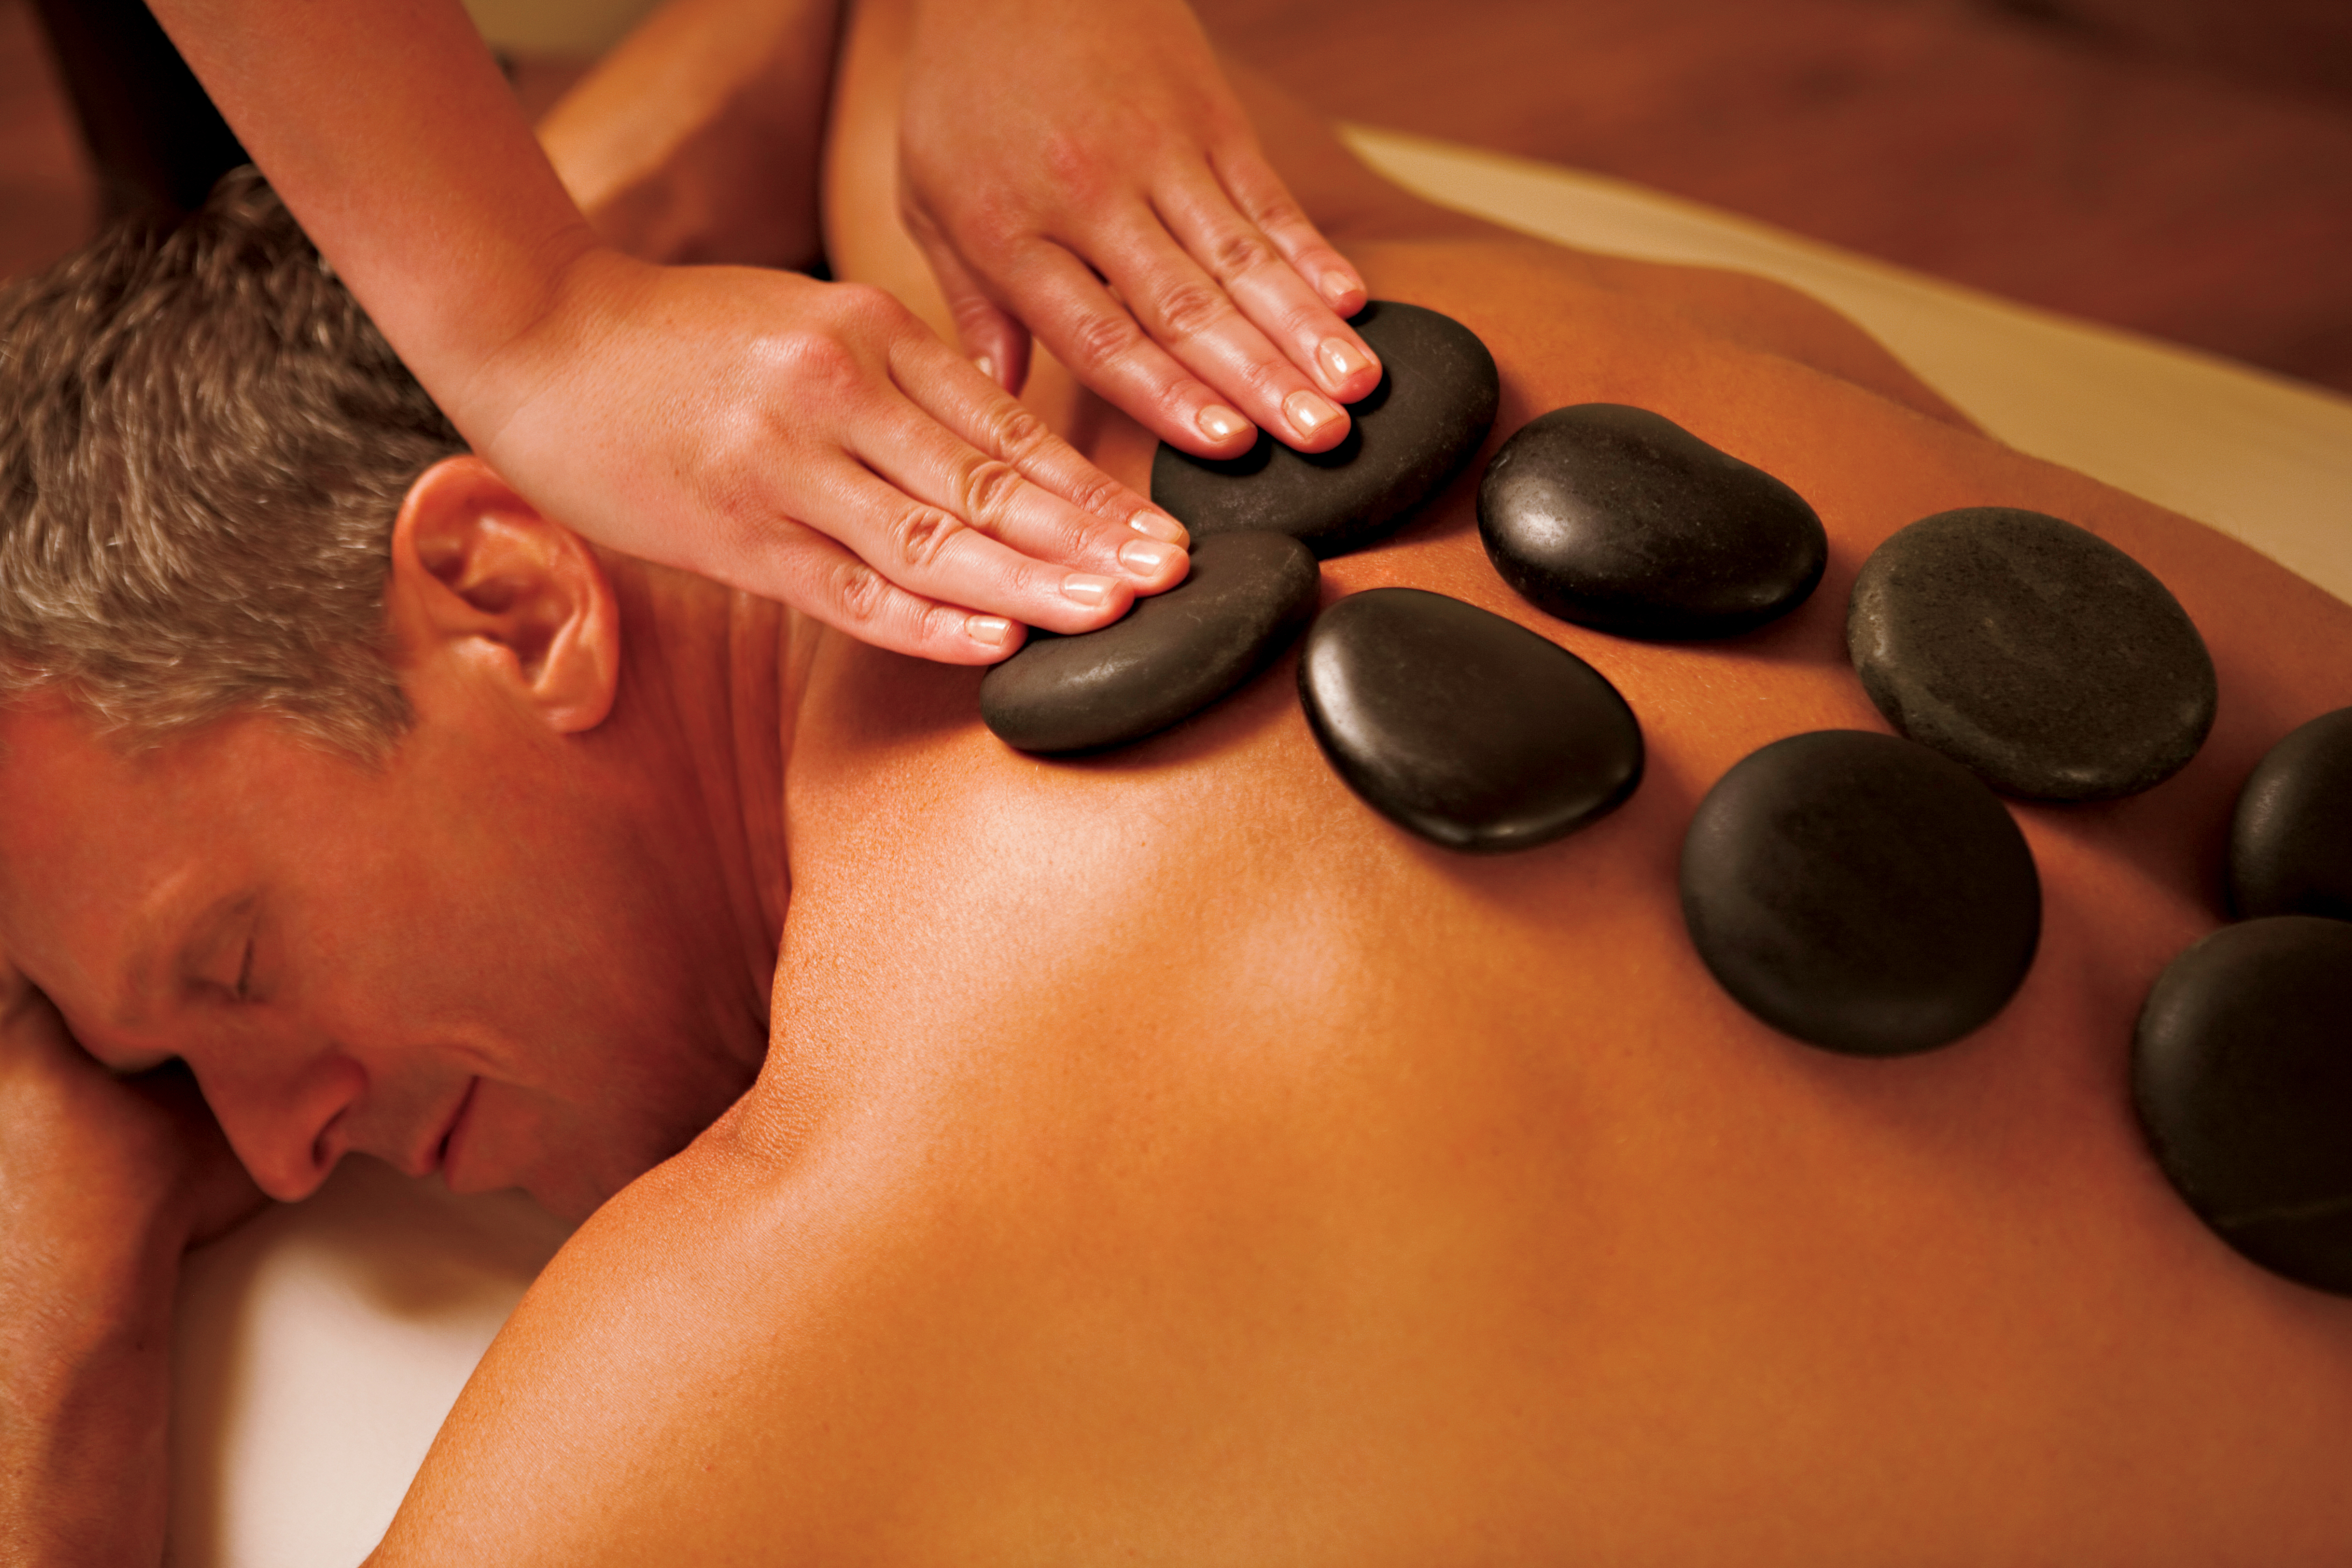 antropoti-concierge-service-croatia-massage-stones